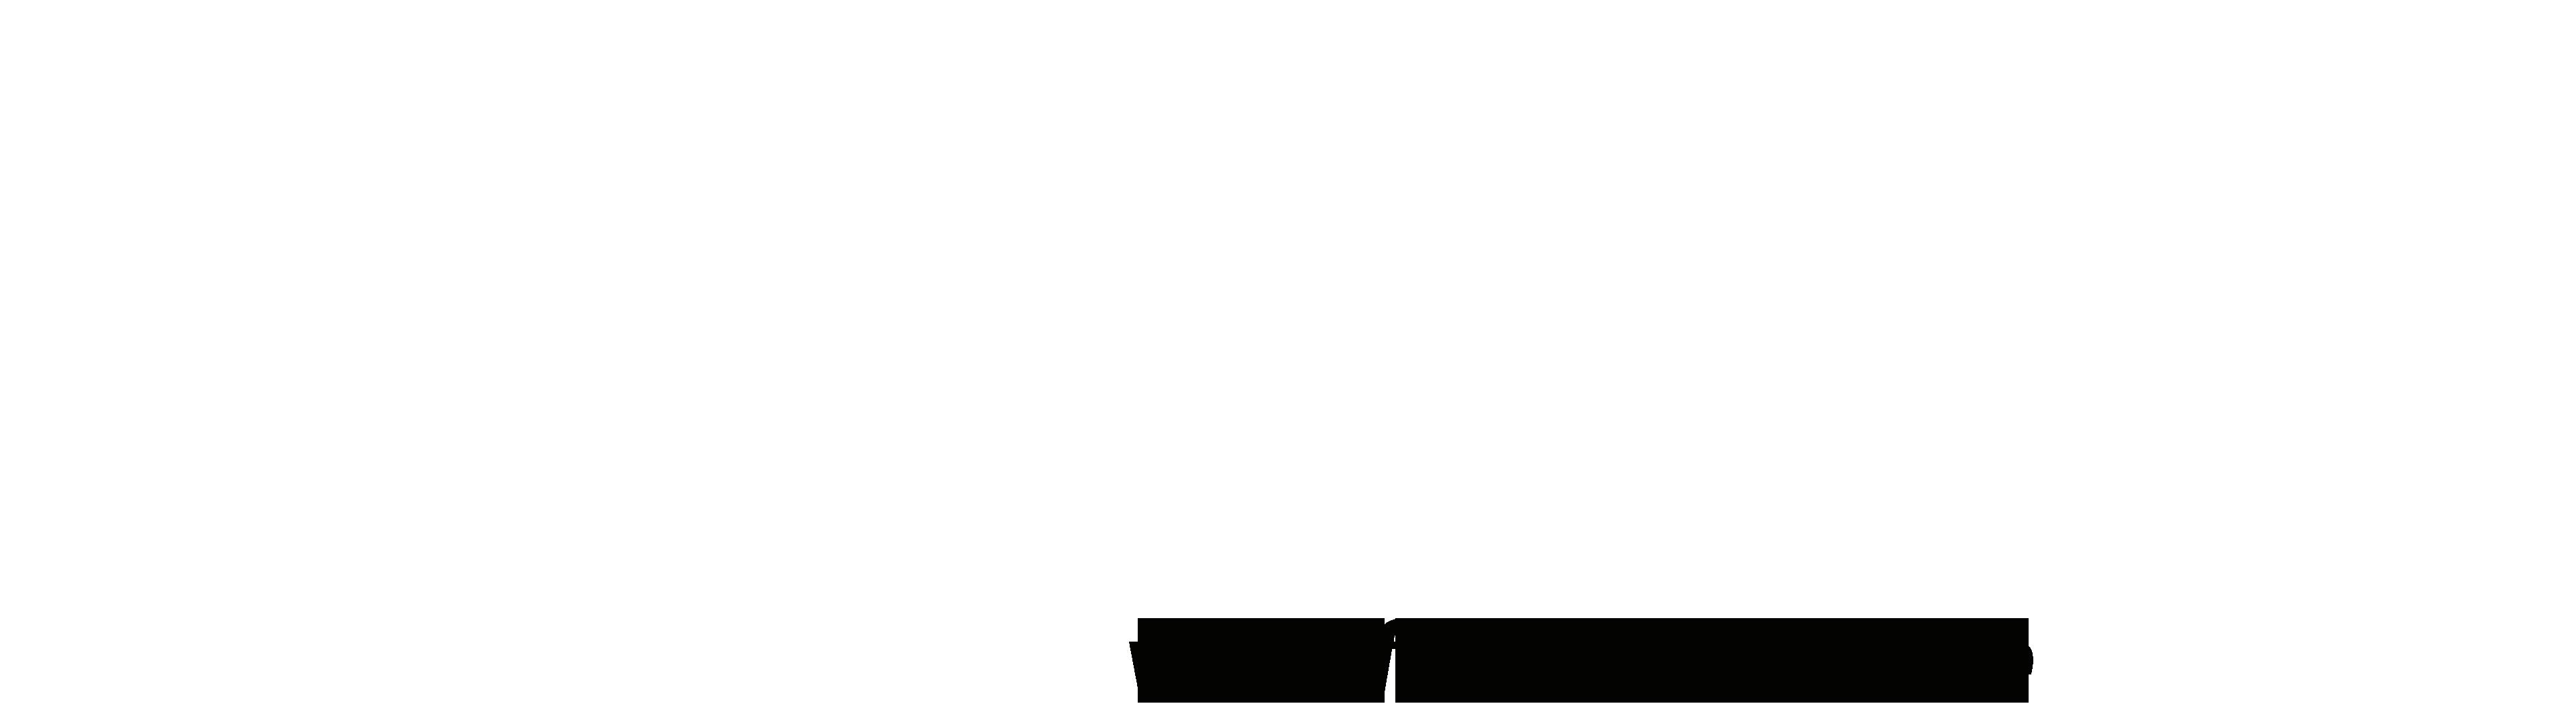 web-for-the-future